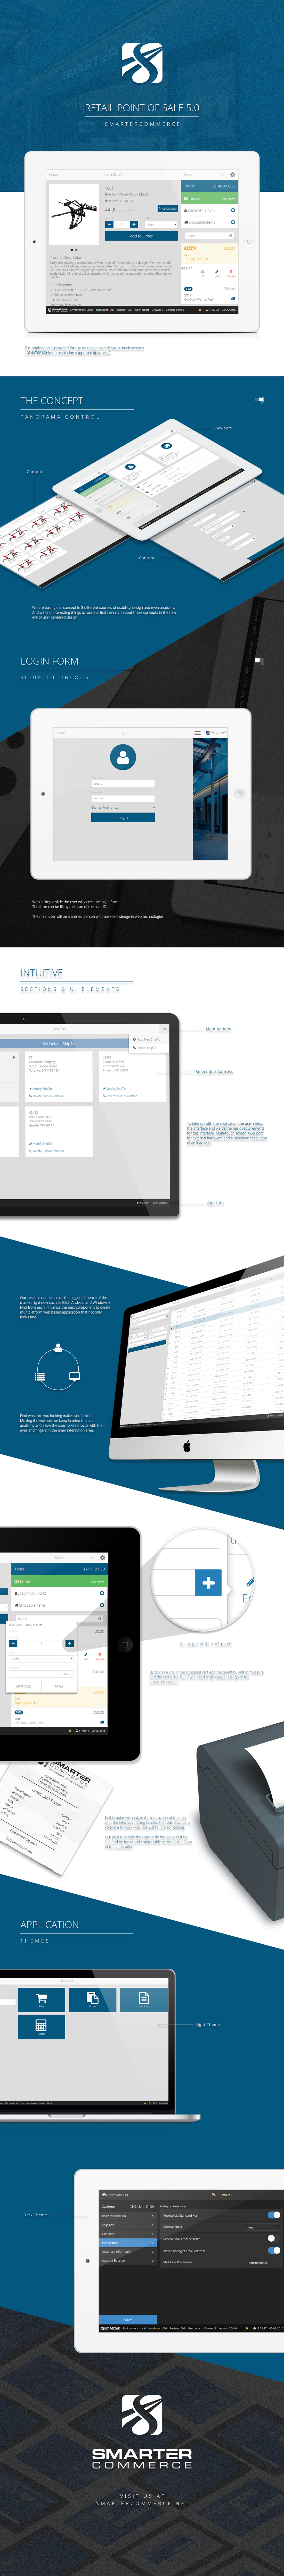 Retail Point of Sale pos UI ux Web application design